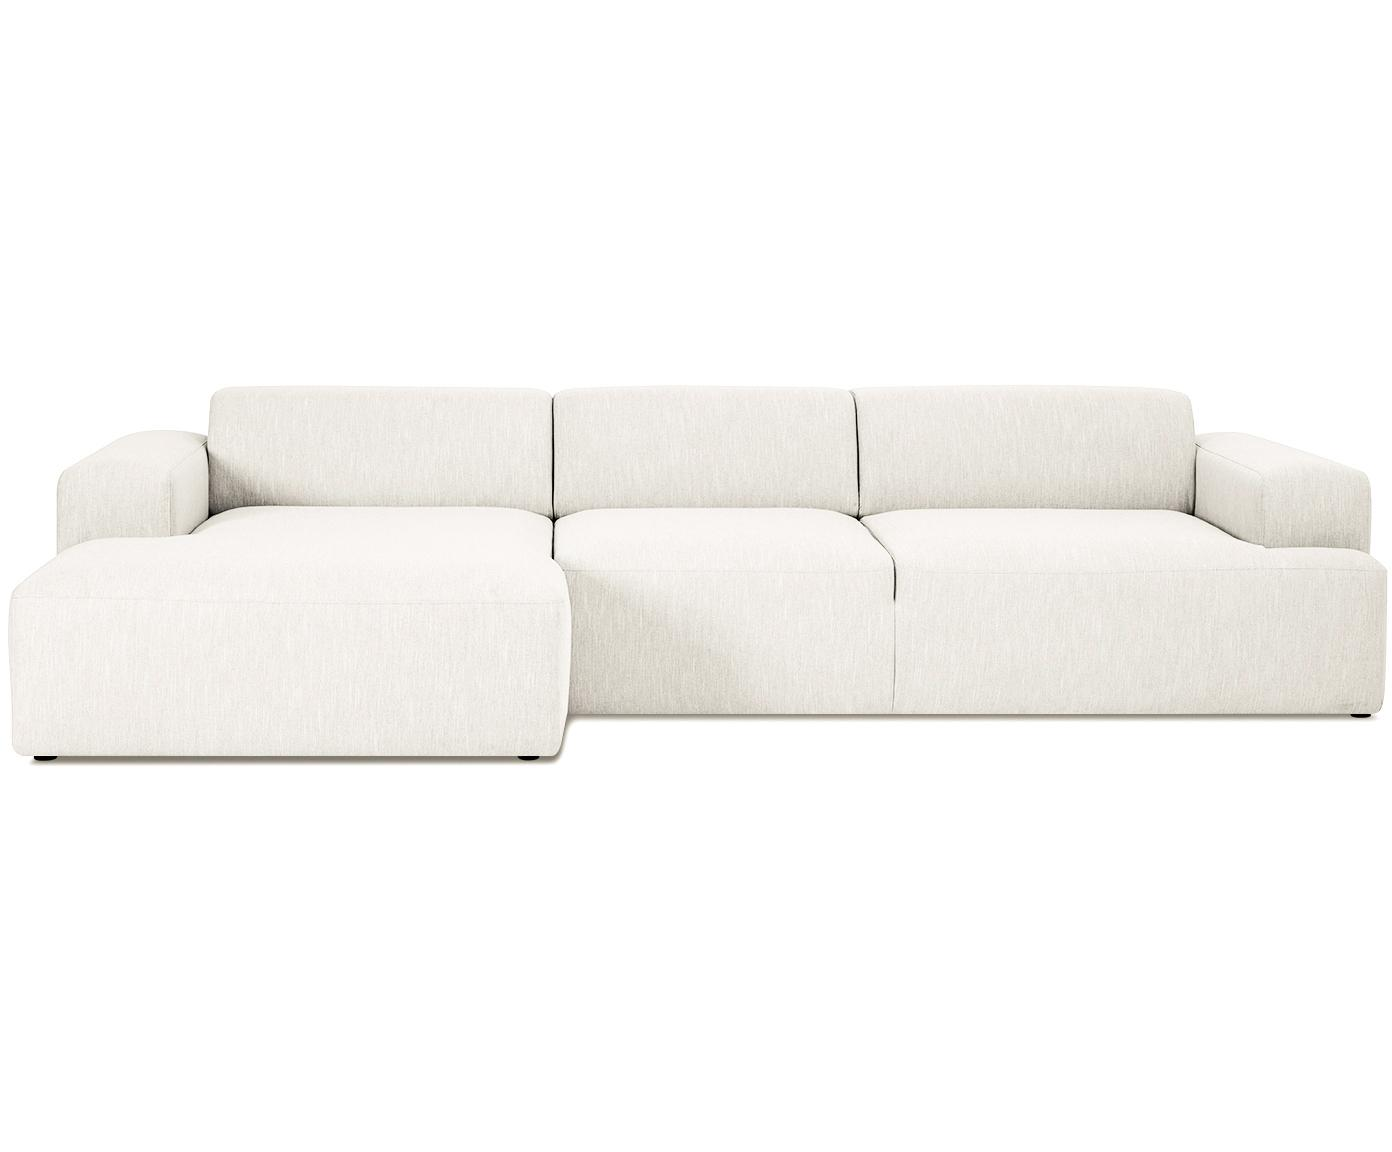 Canapé d'angle tissu beige 4 places Melva, Tissu beige